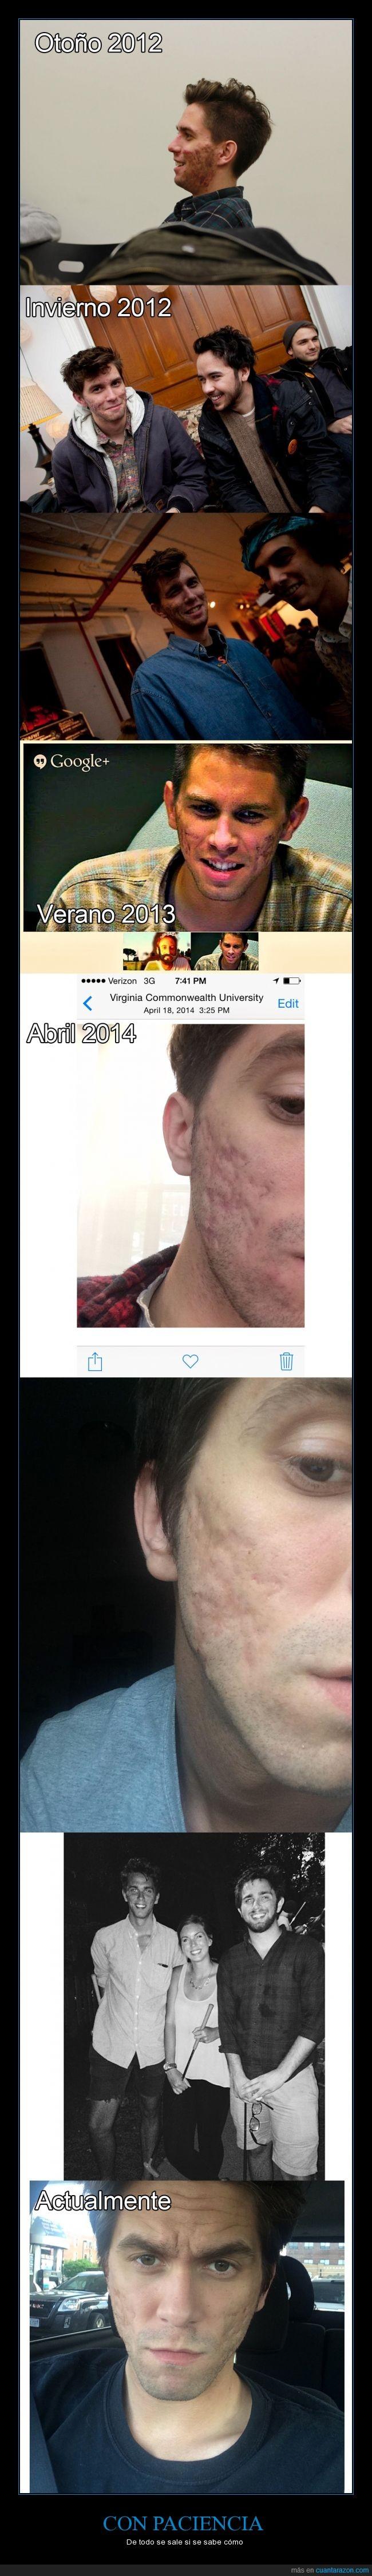 accutane,acné,cara,cicatriz,granos,severo,tratamiento